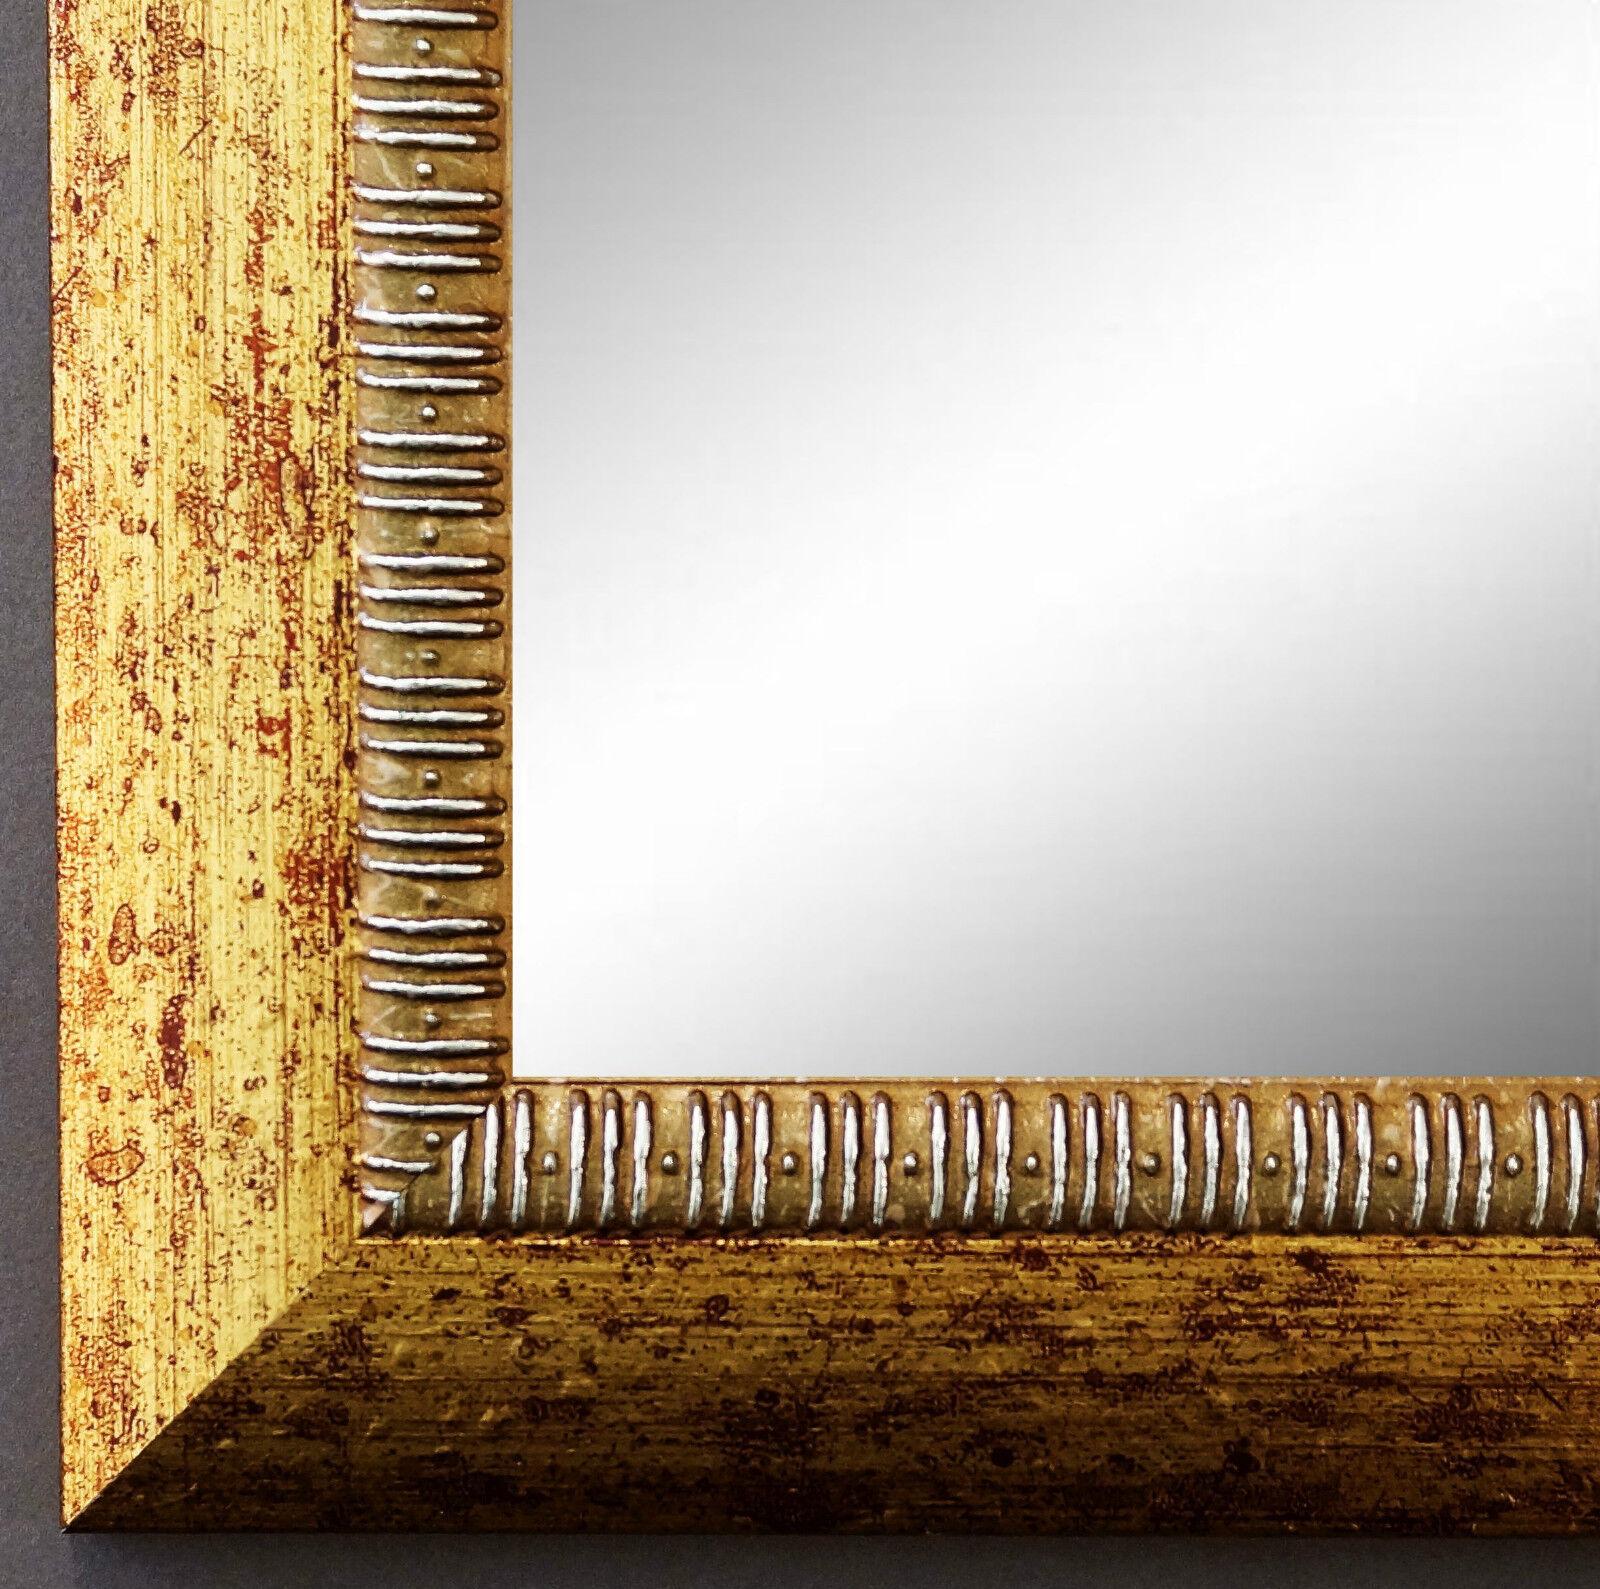 Wandspiegel Hochformat Querformat Turin Antik Gold 4,0 - NEU alle Größen